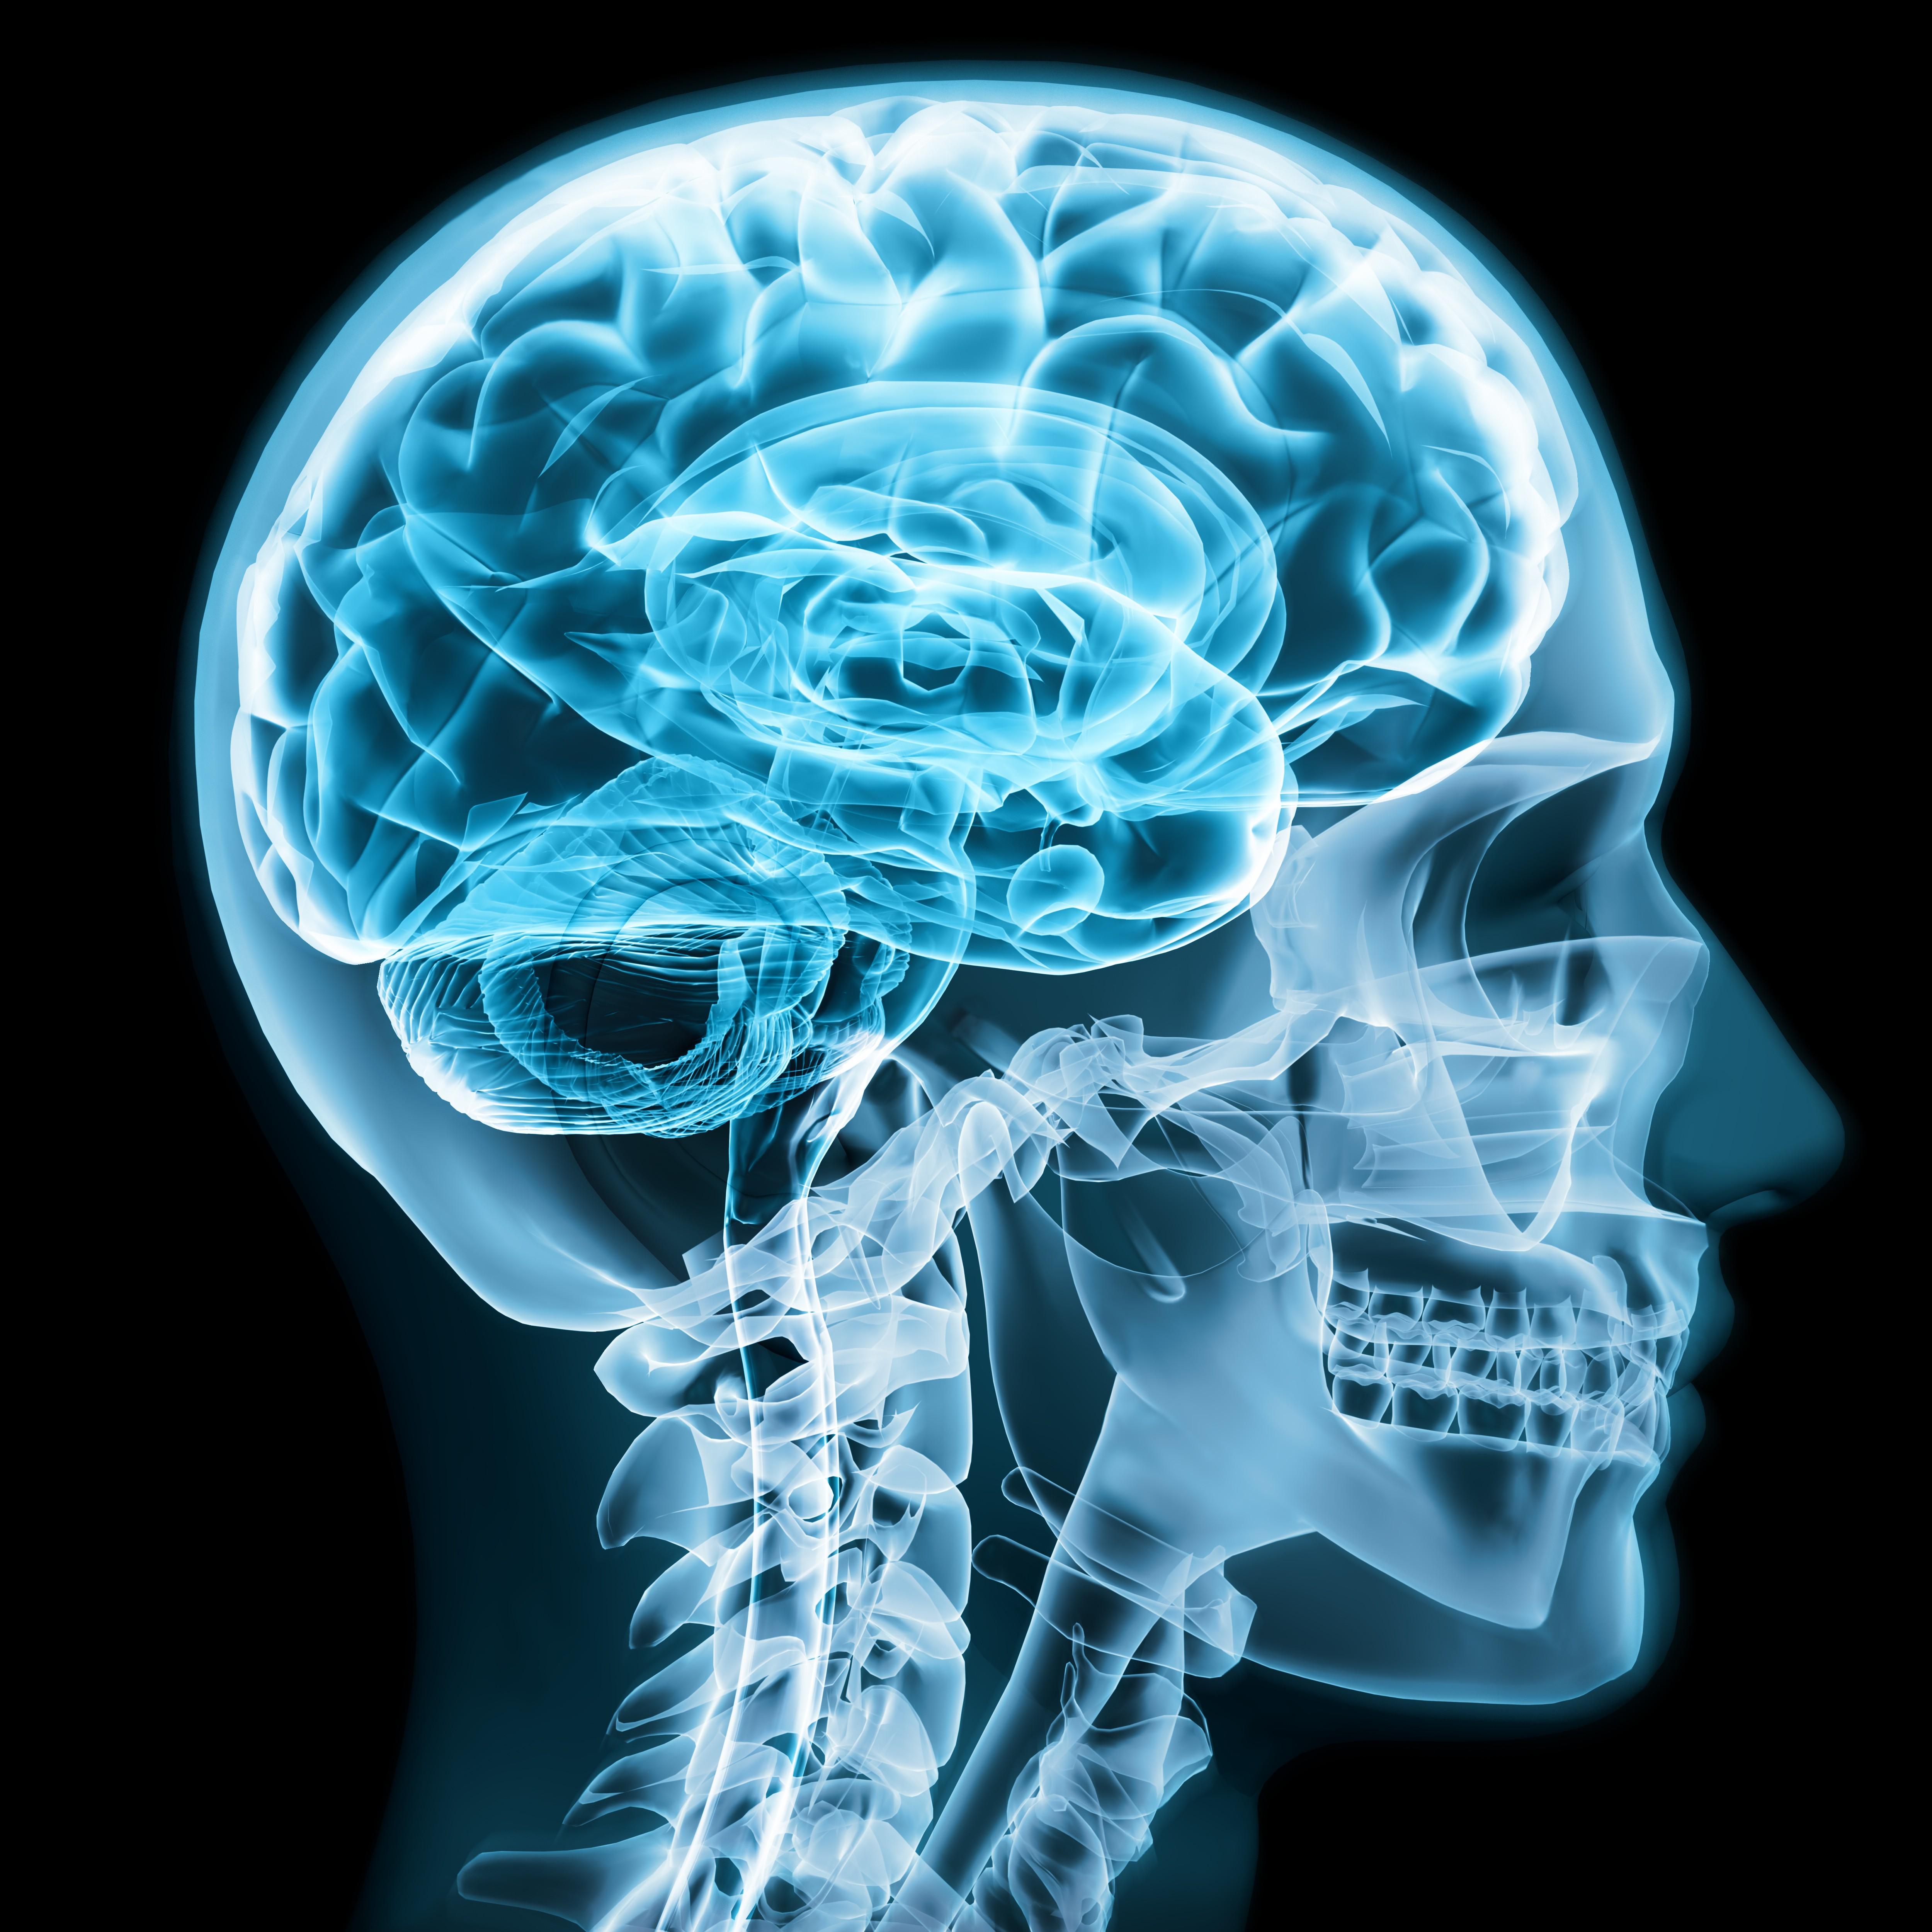 New York surgeons find tapeworm in Rachel Palma's brain